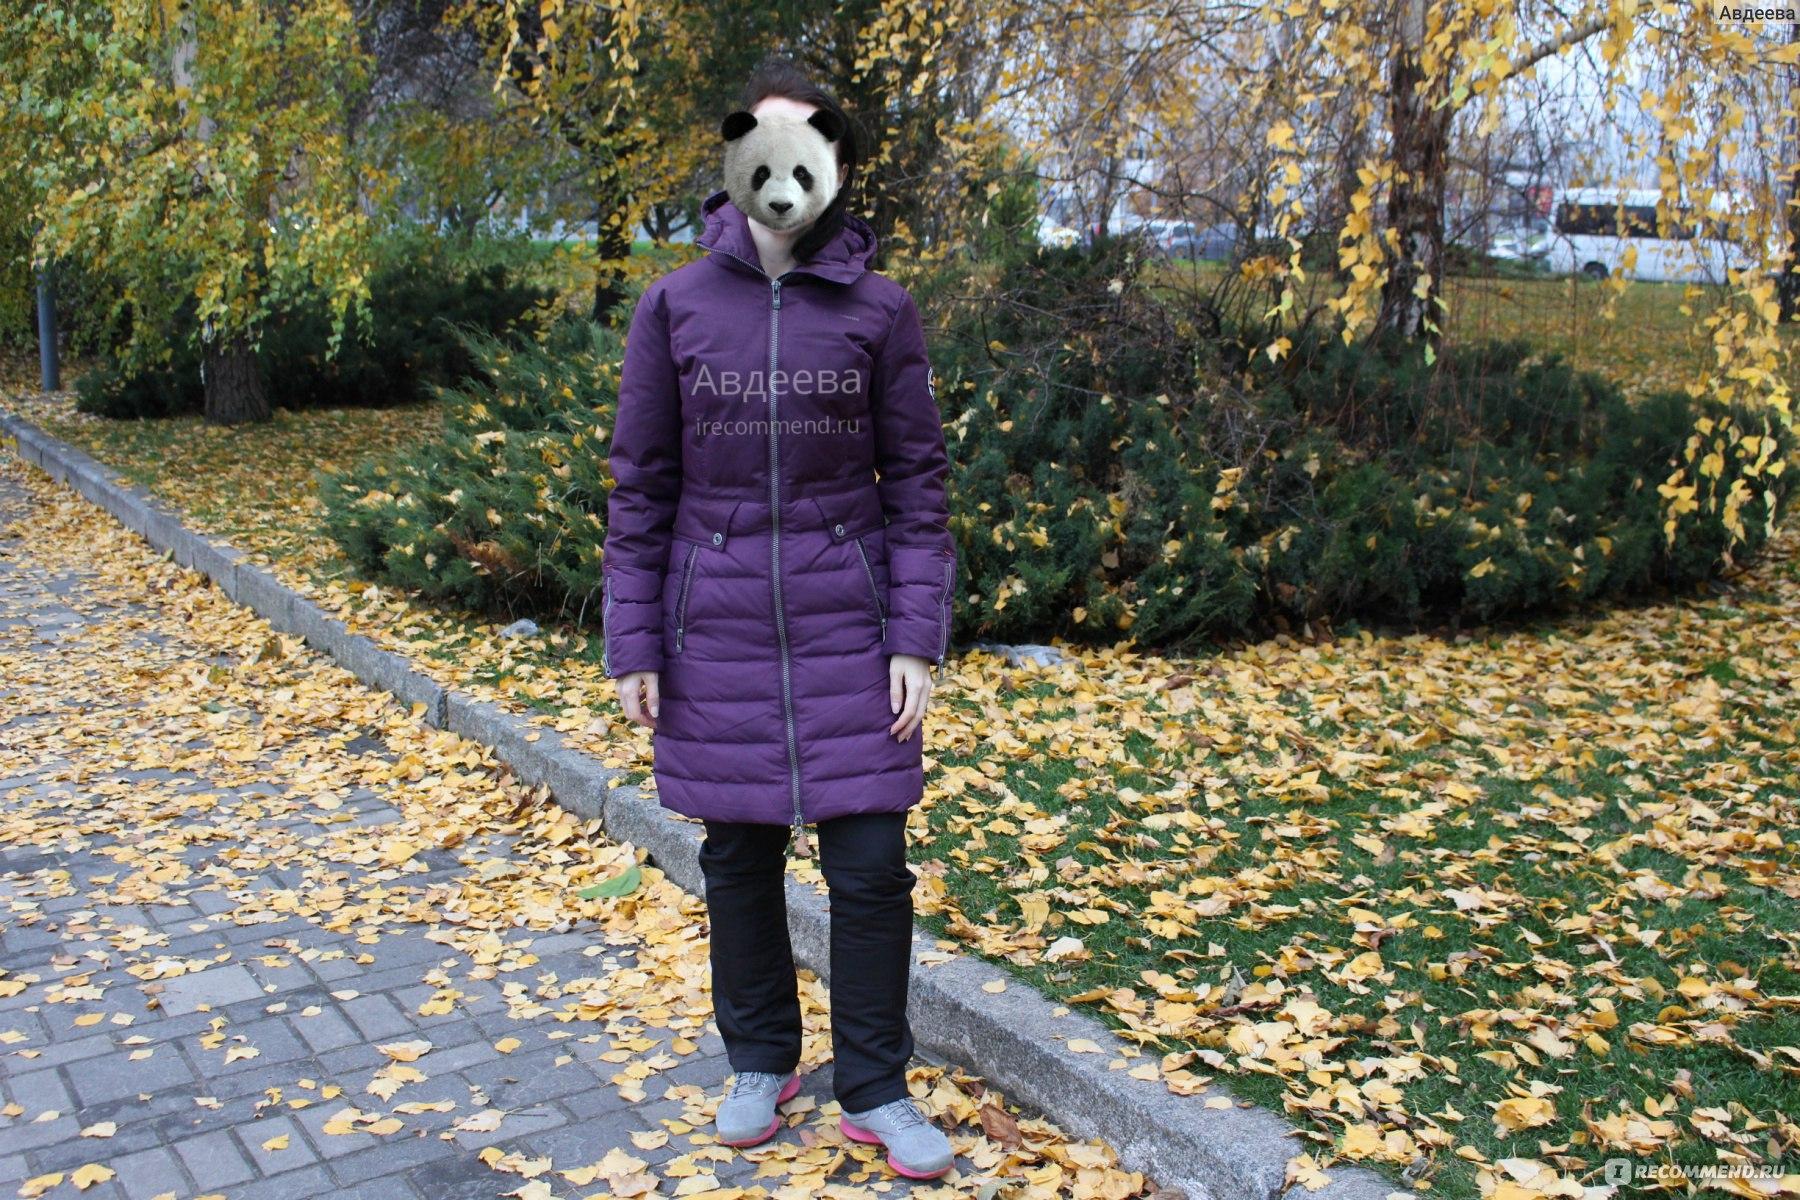 1ccc04a3a2bcf Куртка пуховая женская Outventure Артикул LWV203P442 - «Пуховик ...